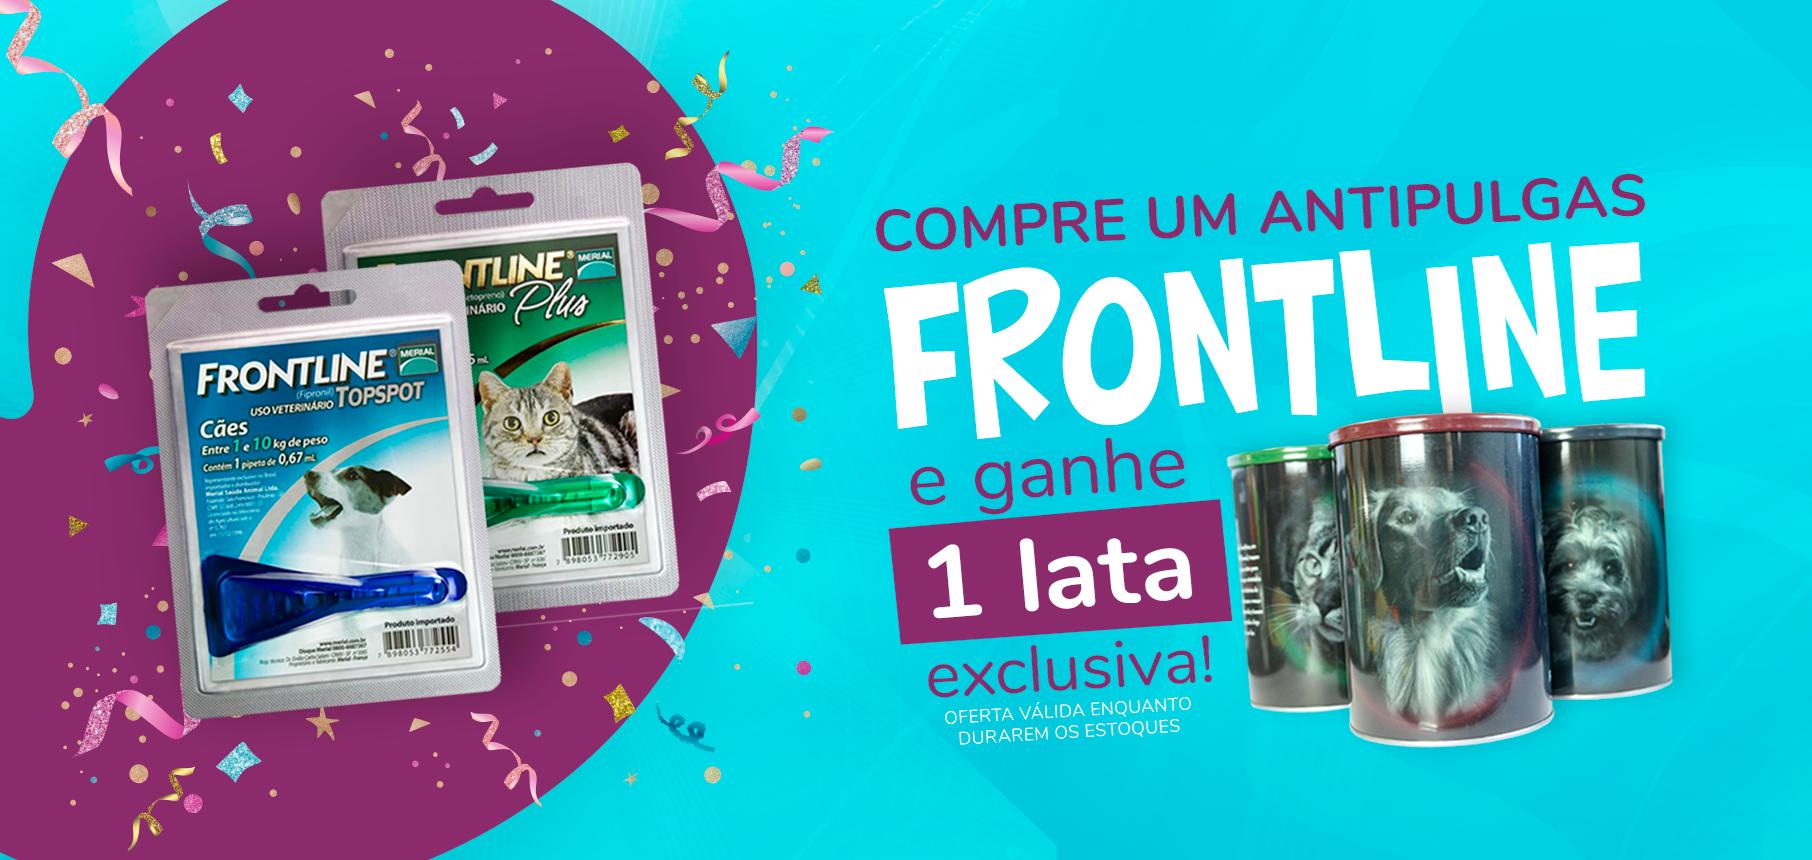 Compre Frotline, Ganhe Lata